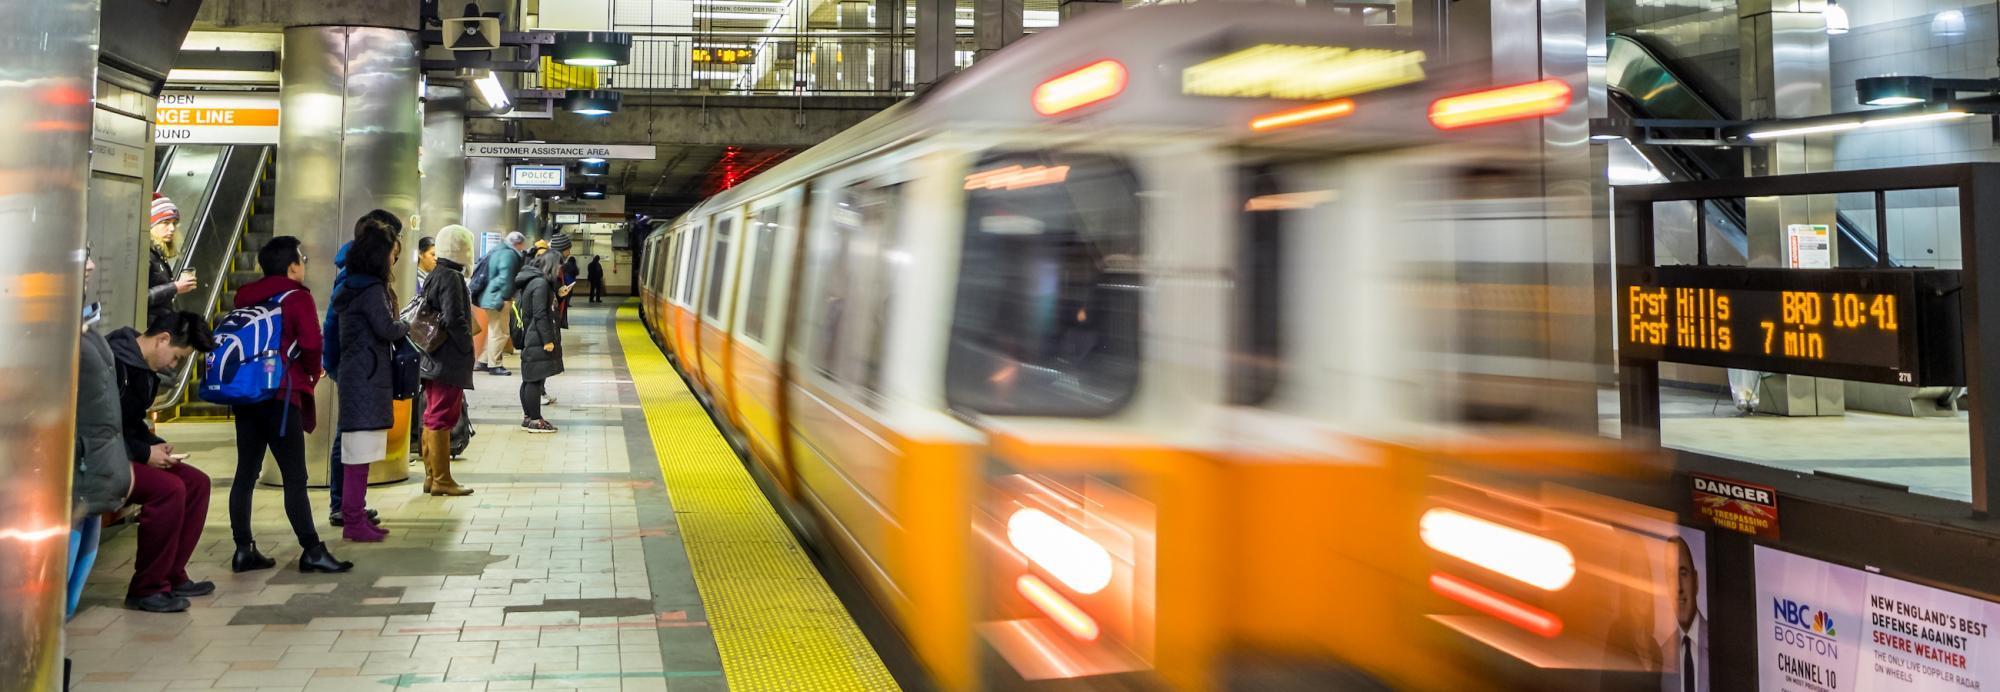 Orange Line in motion